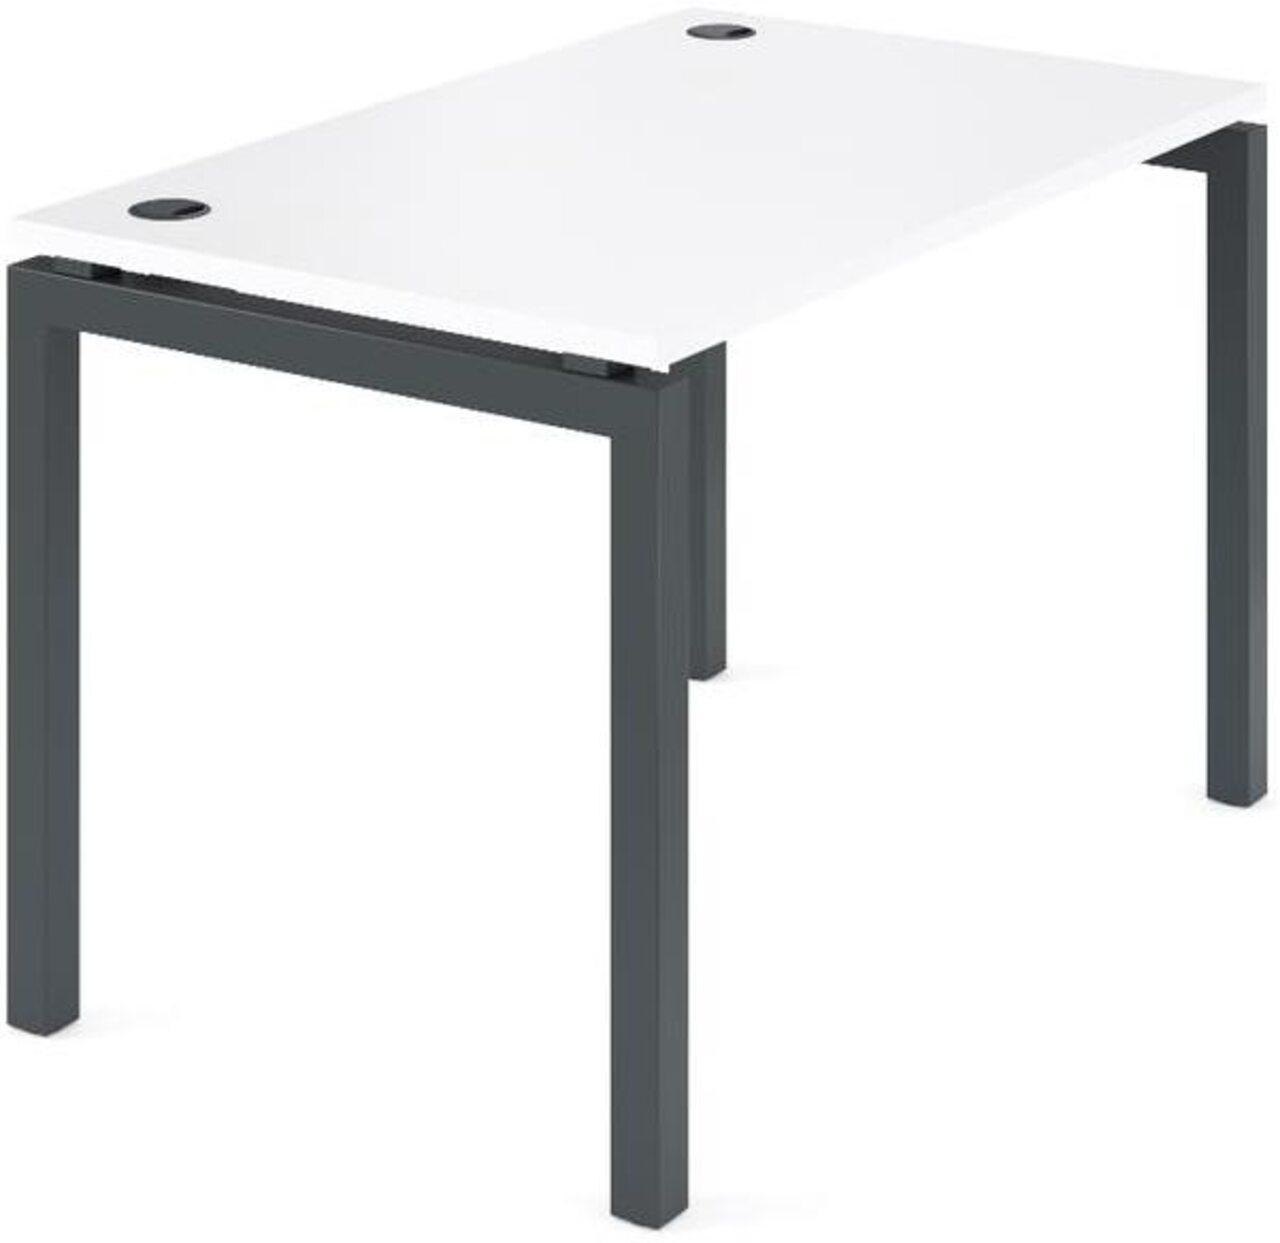 Стол на металлокаркасе  Арго 120x73x76 - фото 1